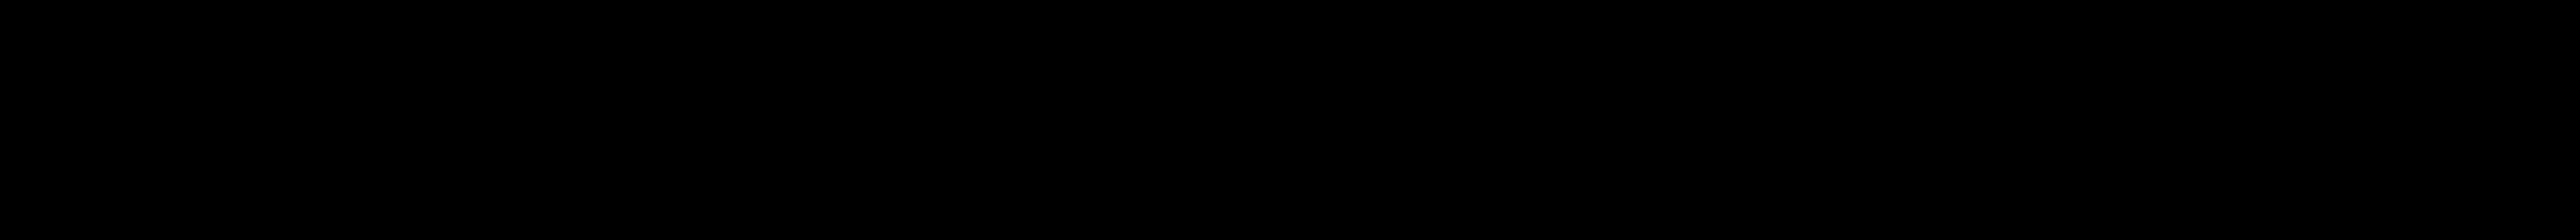 Guanabara Sans Extra Light Italic